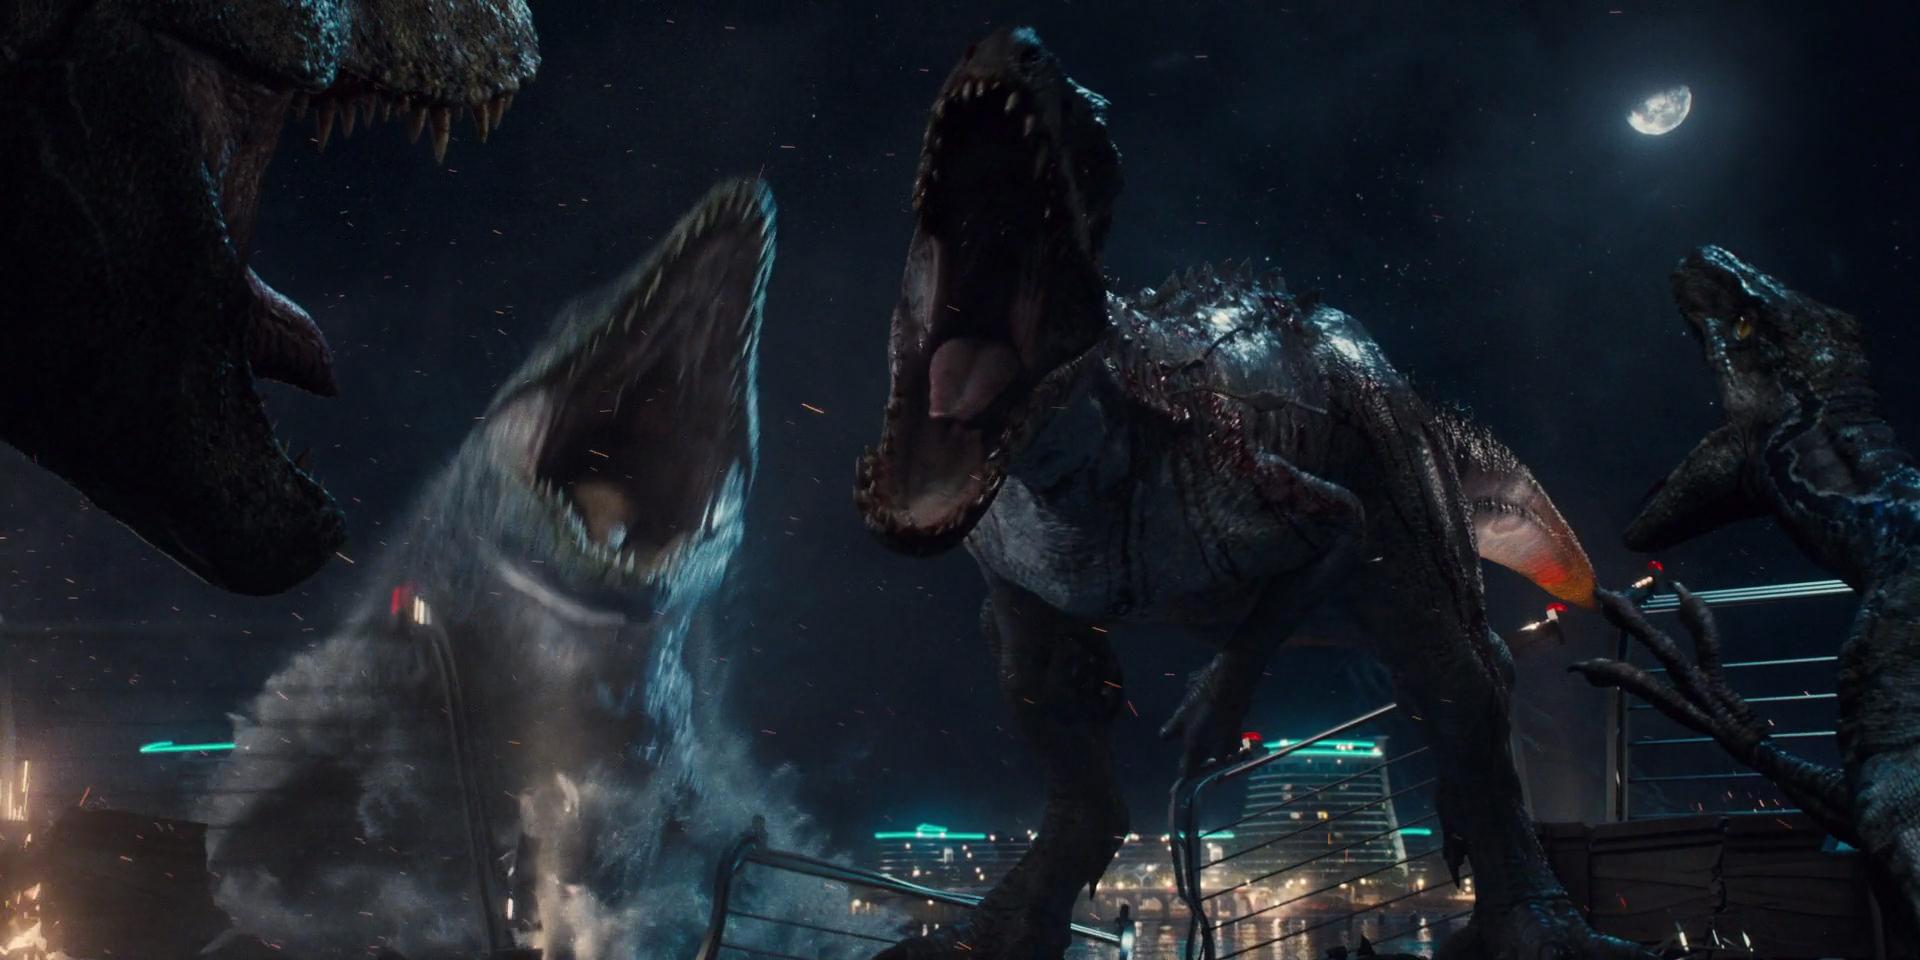 Dating the events of Jurassic World Jurassic-world-movie-screencaps.com-13215